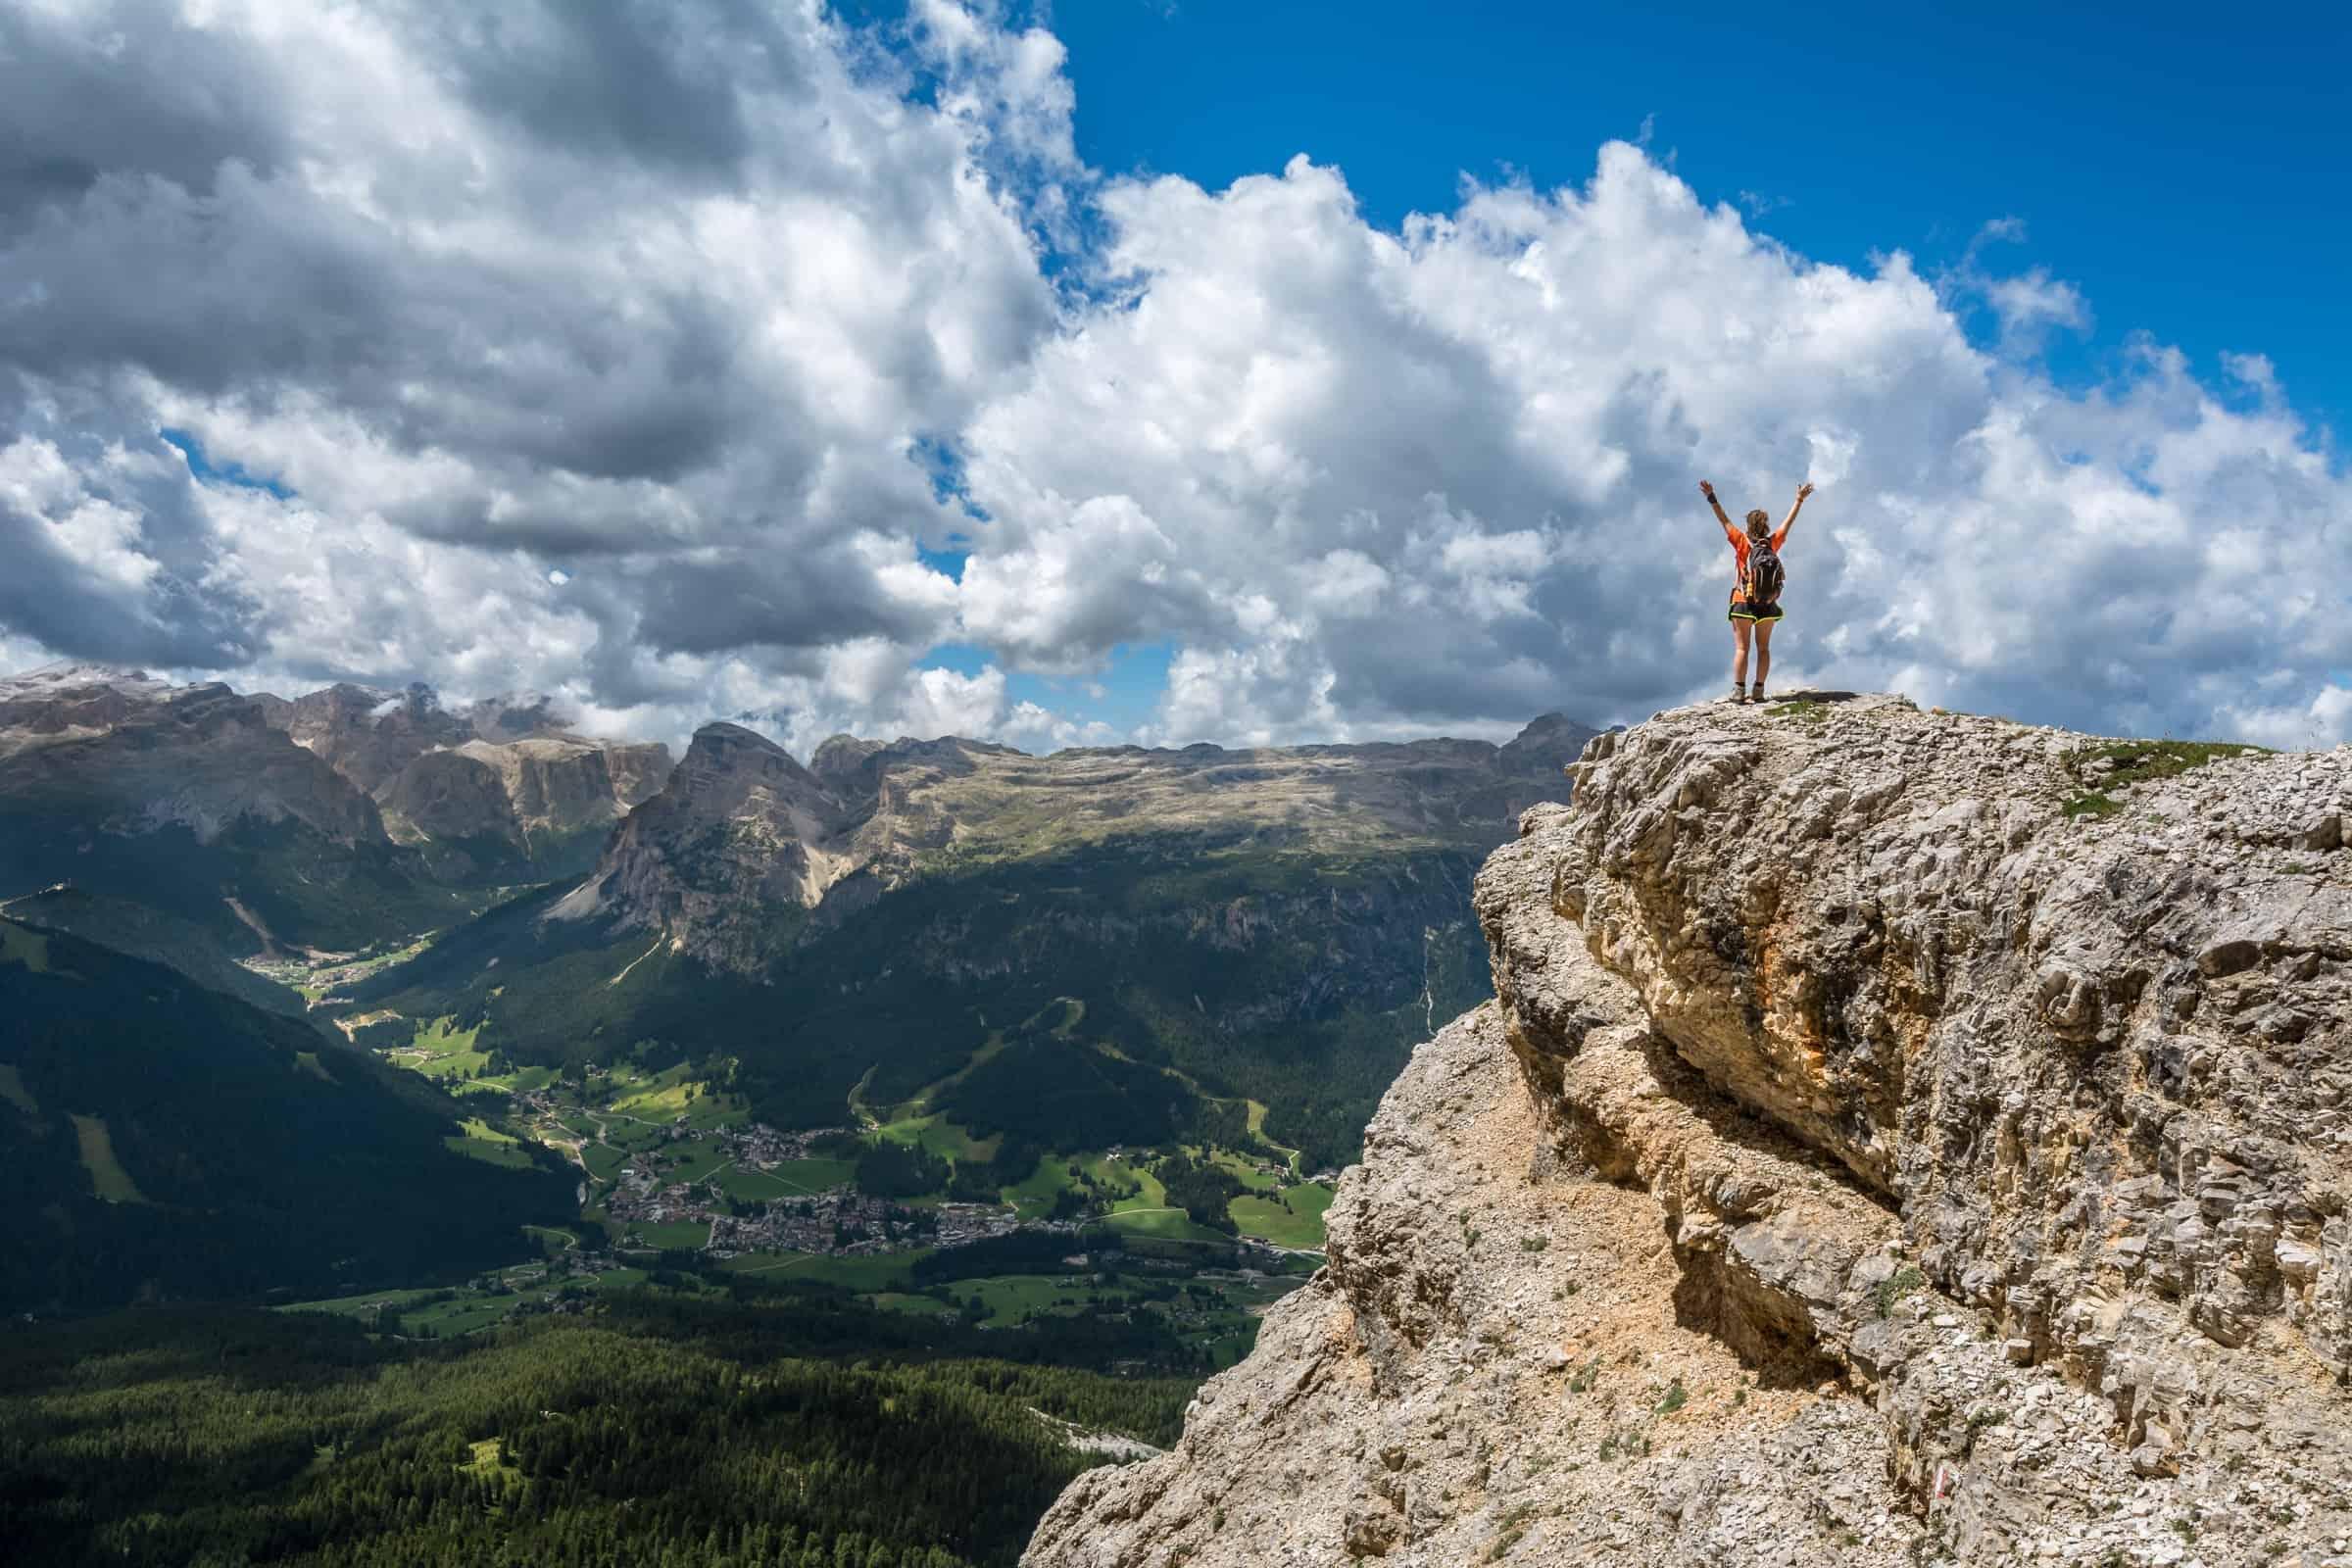 Creating a Bigger Vision - Entrepreneur